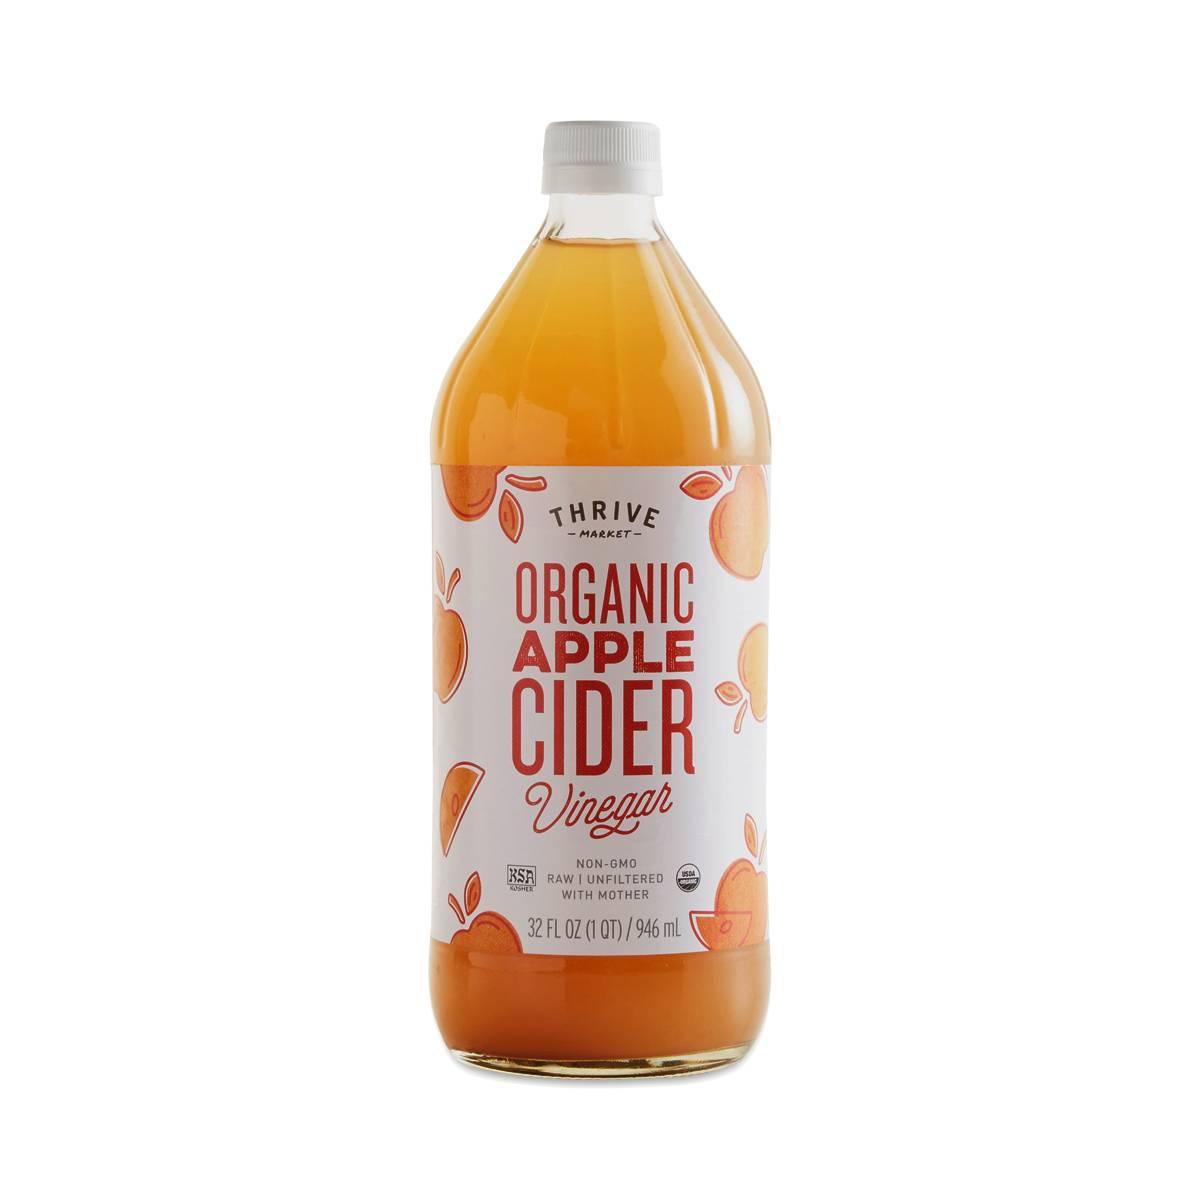 Organic Apple Cider Vinegar - Thrive Market